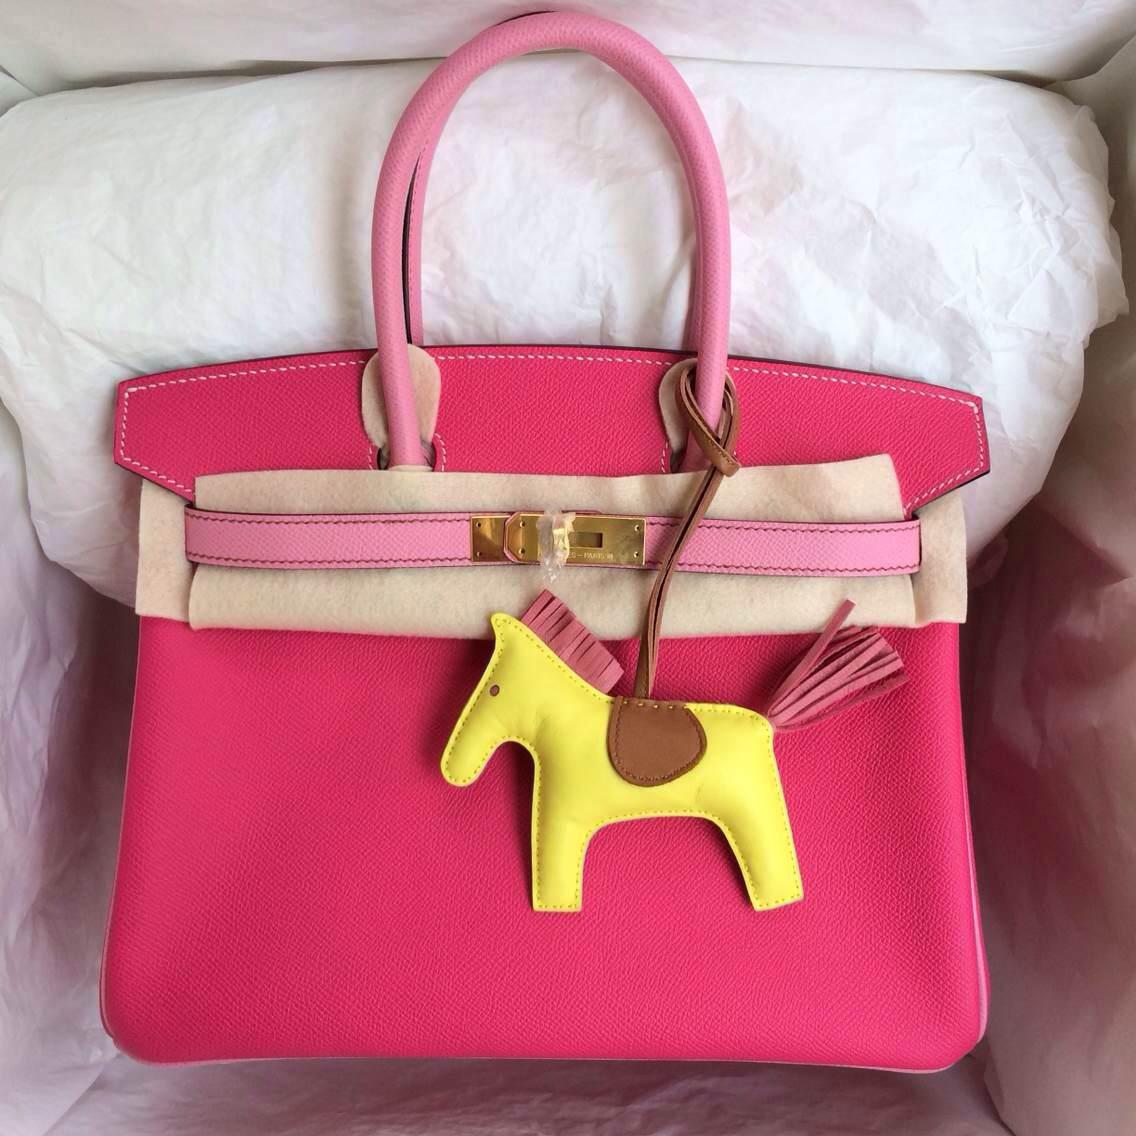 On Sale Hermes Birkin Bag E5 Rose Tyrien/5P Pink Epsom Leather Tote Bag